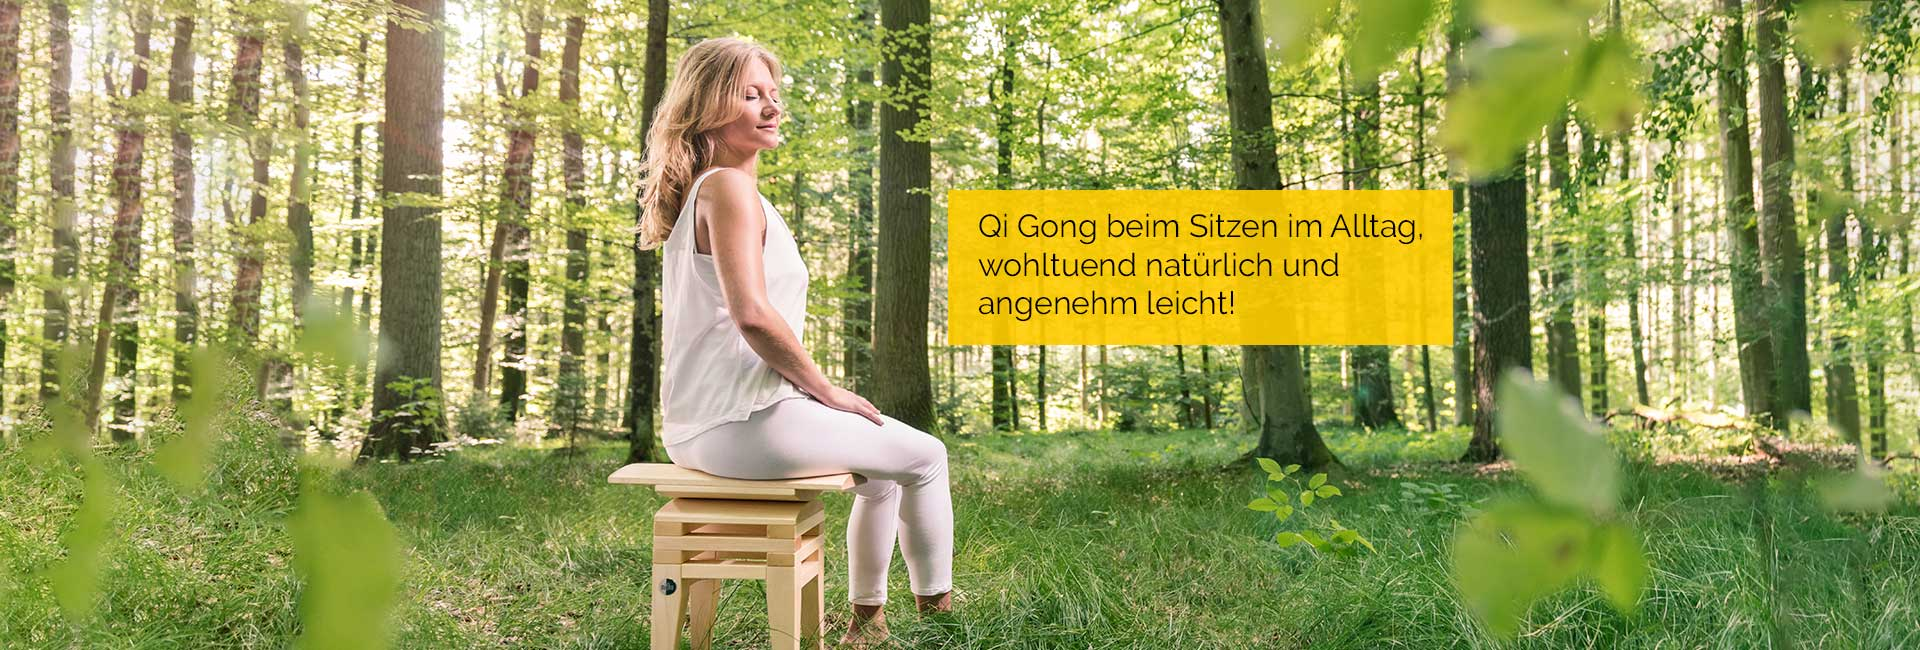 Qigong im Sitzen